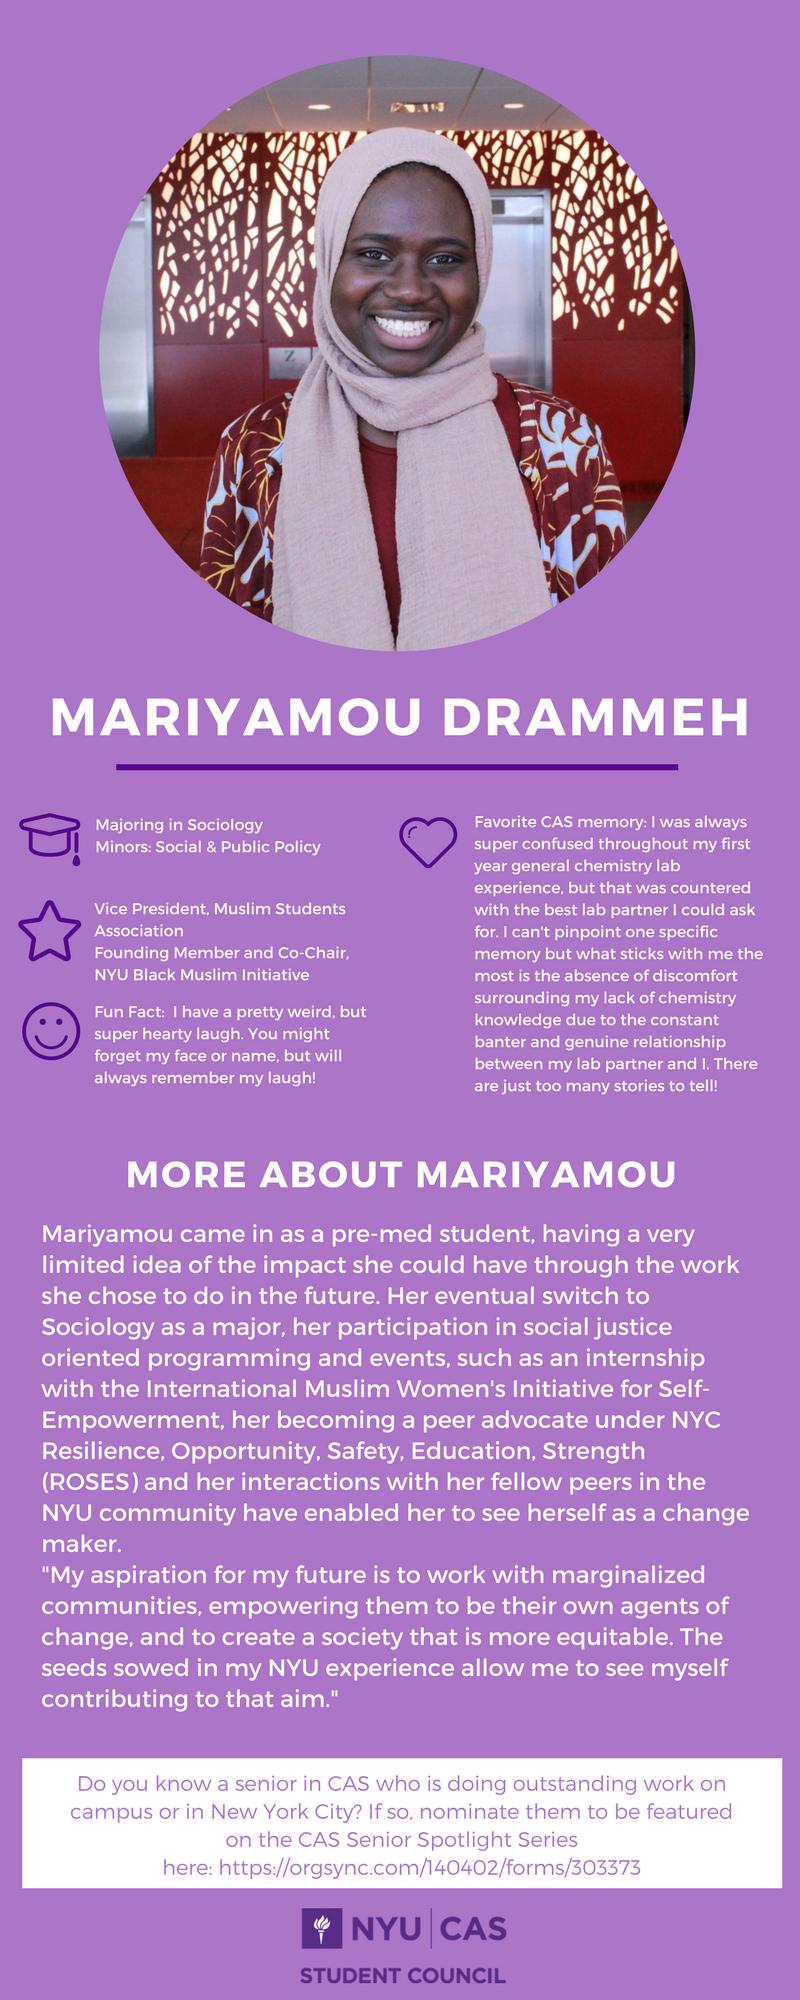 Mariyamou Drammeh